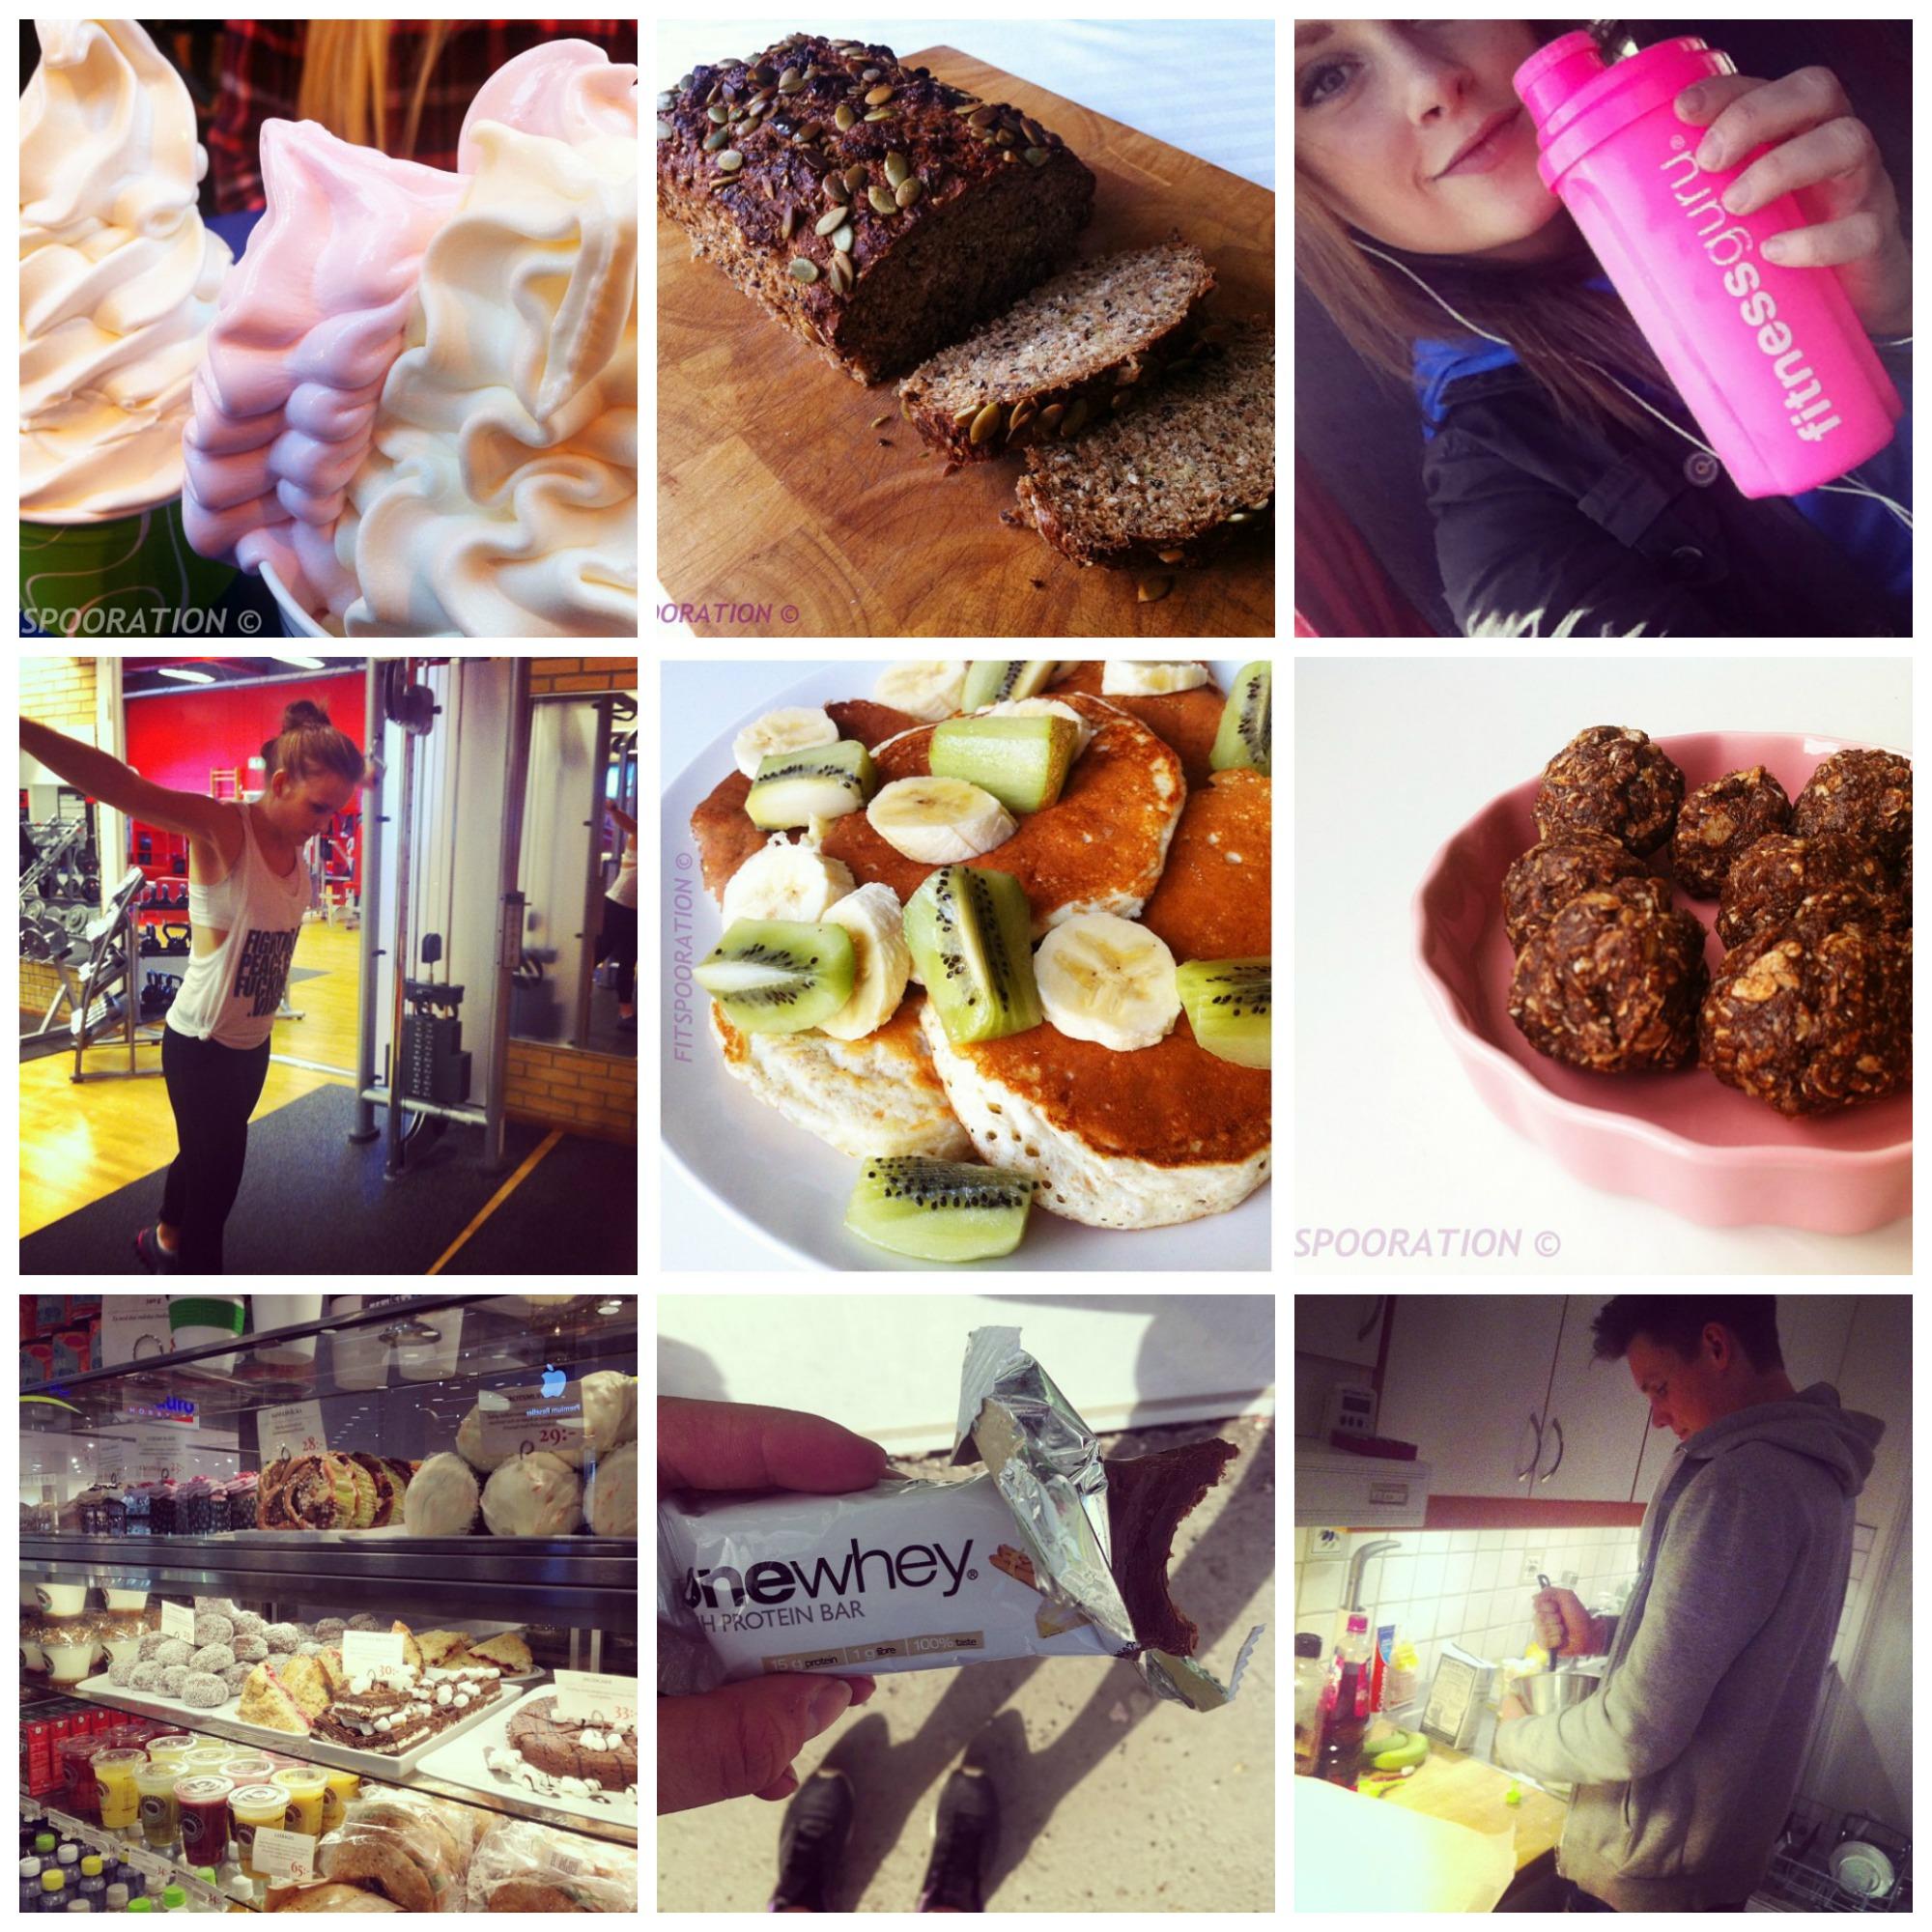 Instagram week fitspooration for My showroom instagram